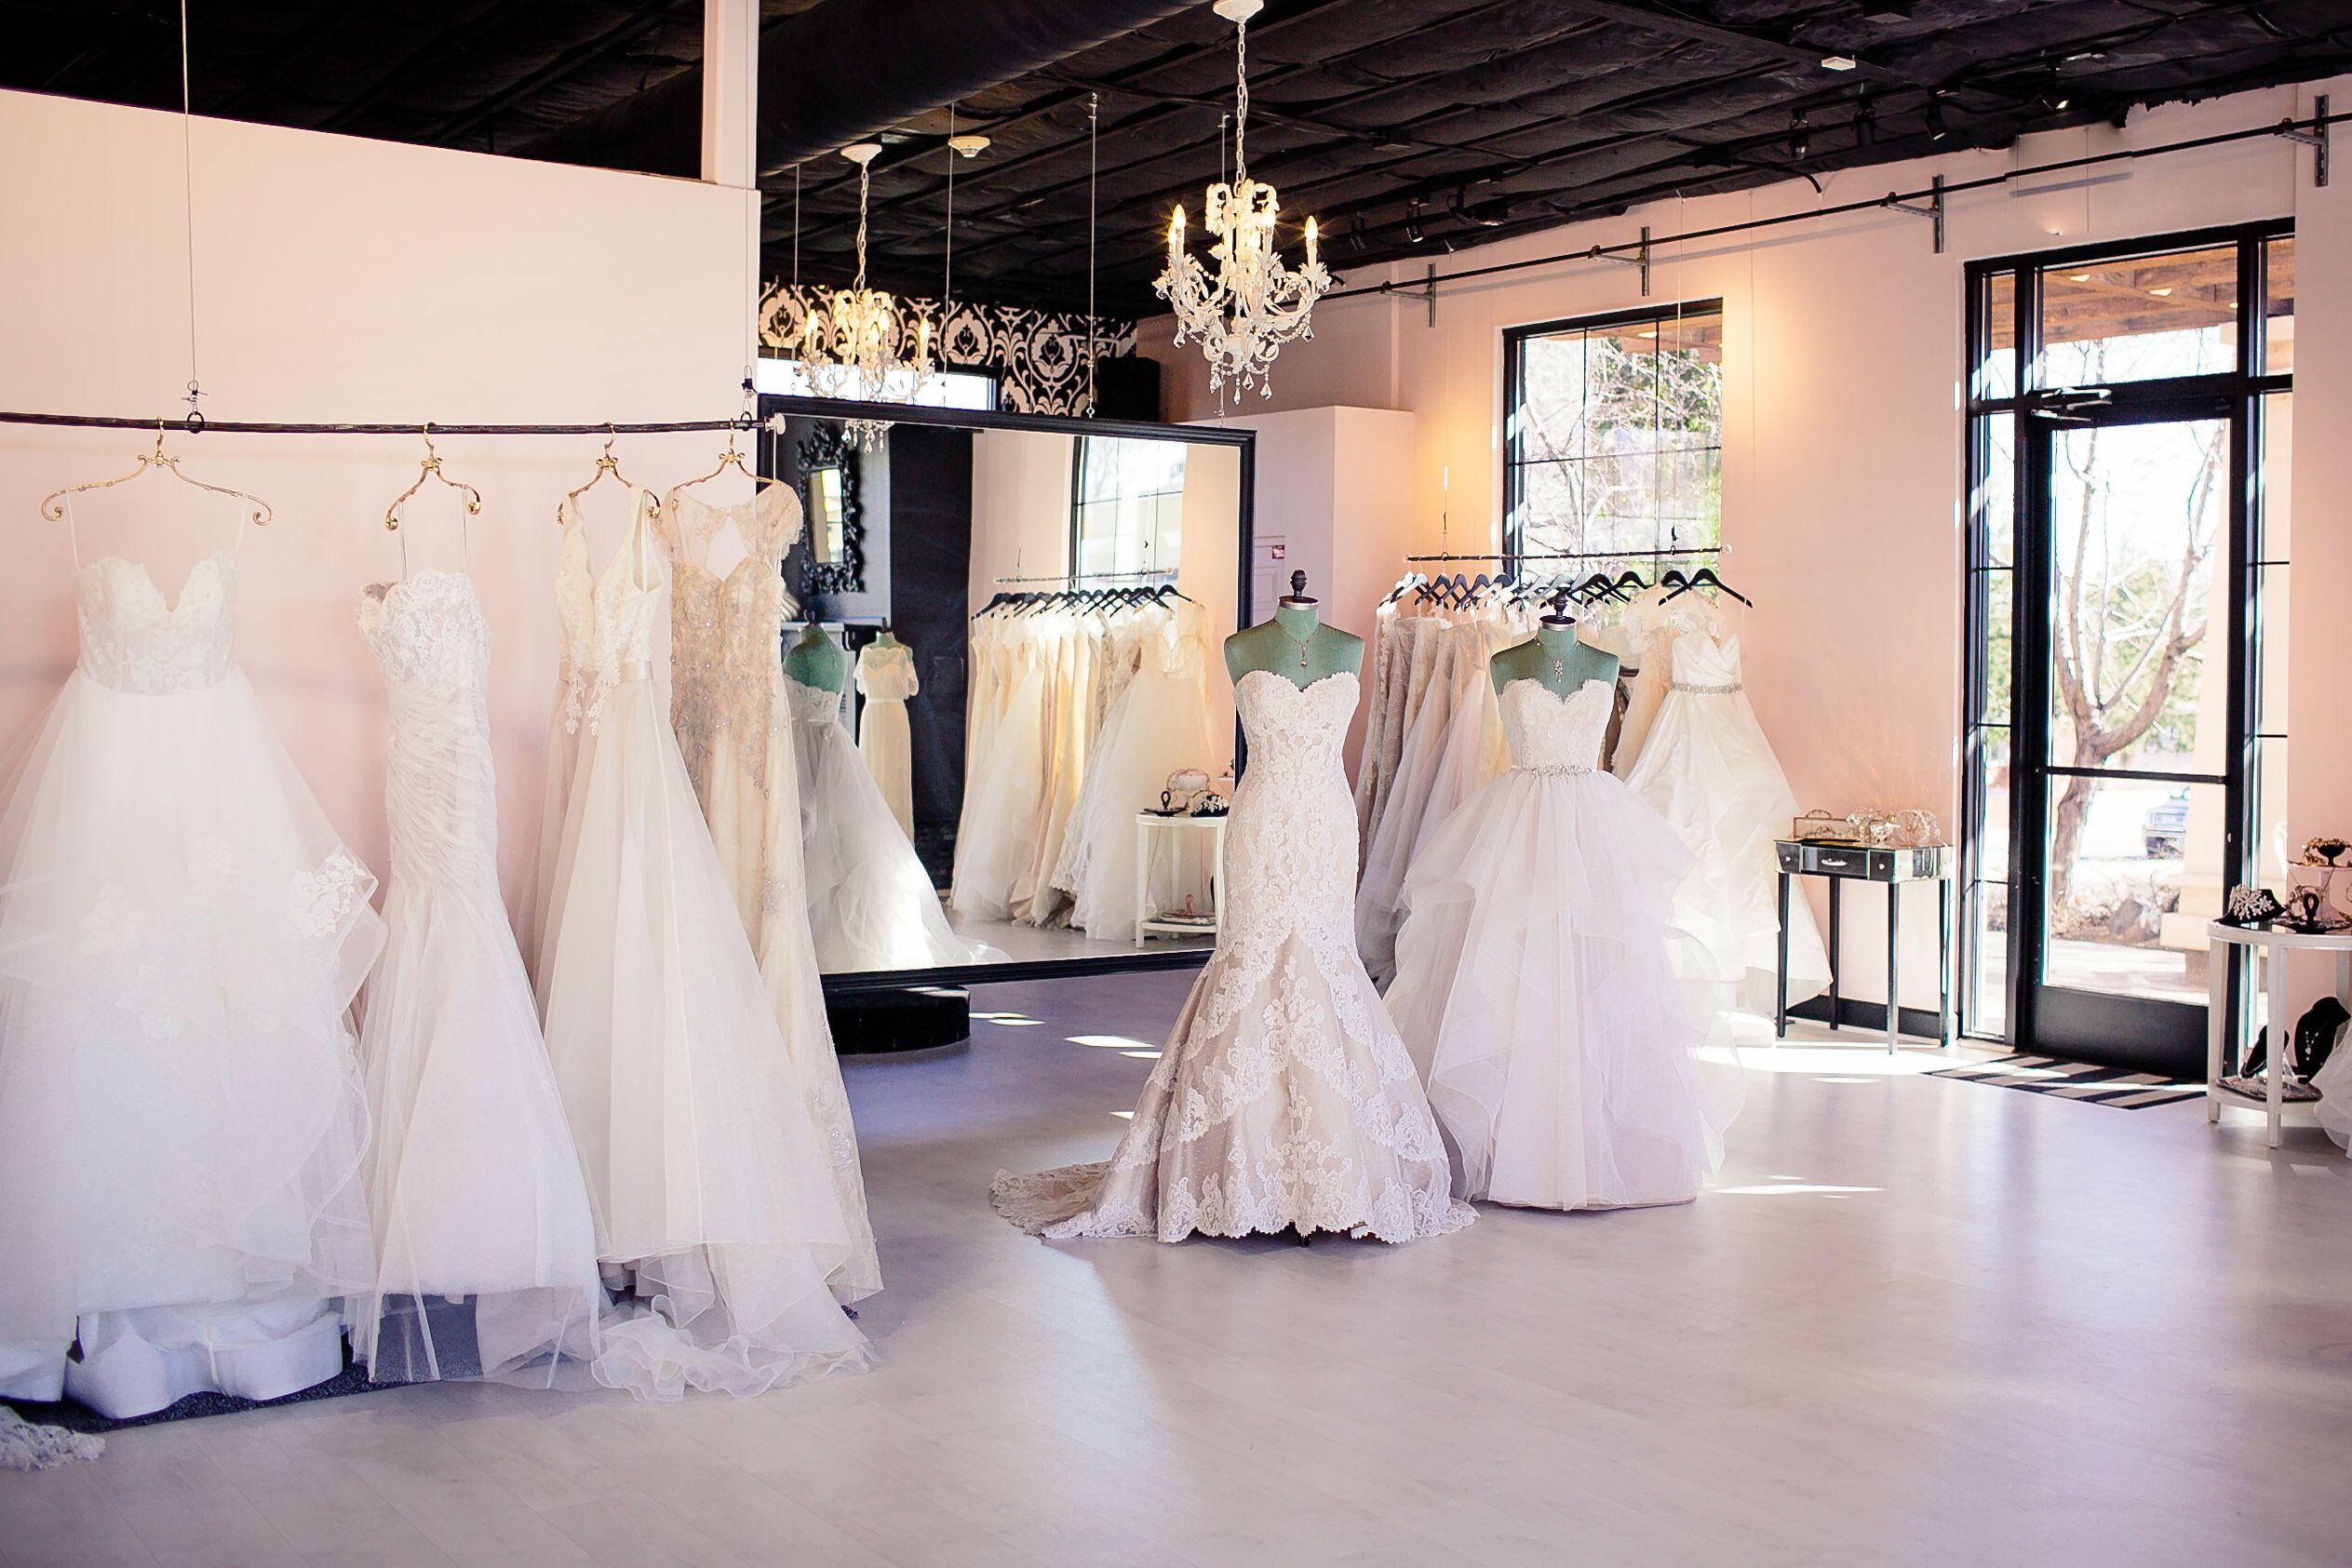 Swoon...a bridal salon - Reno, NV